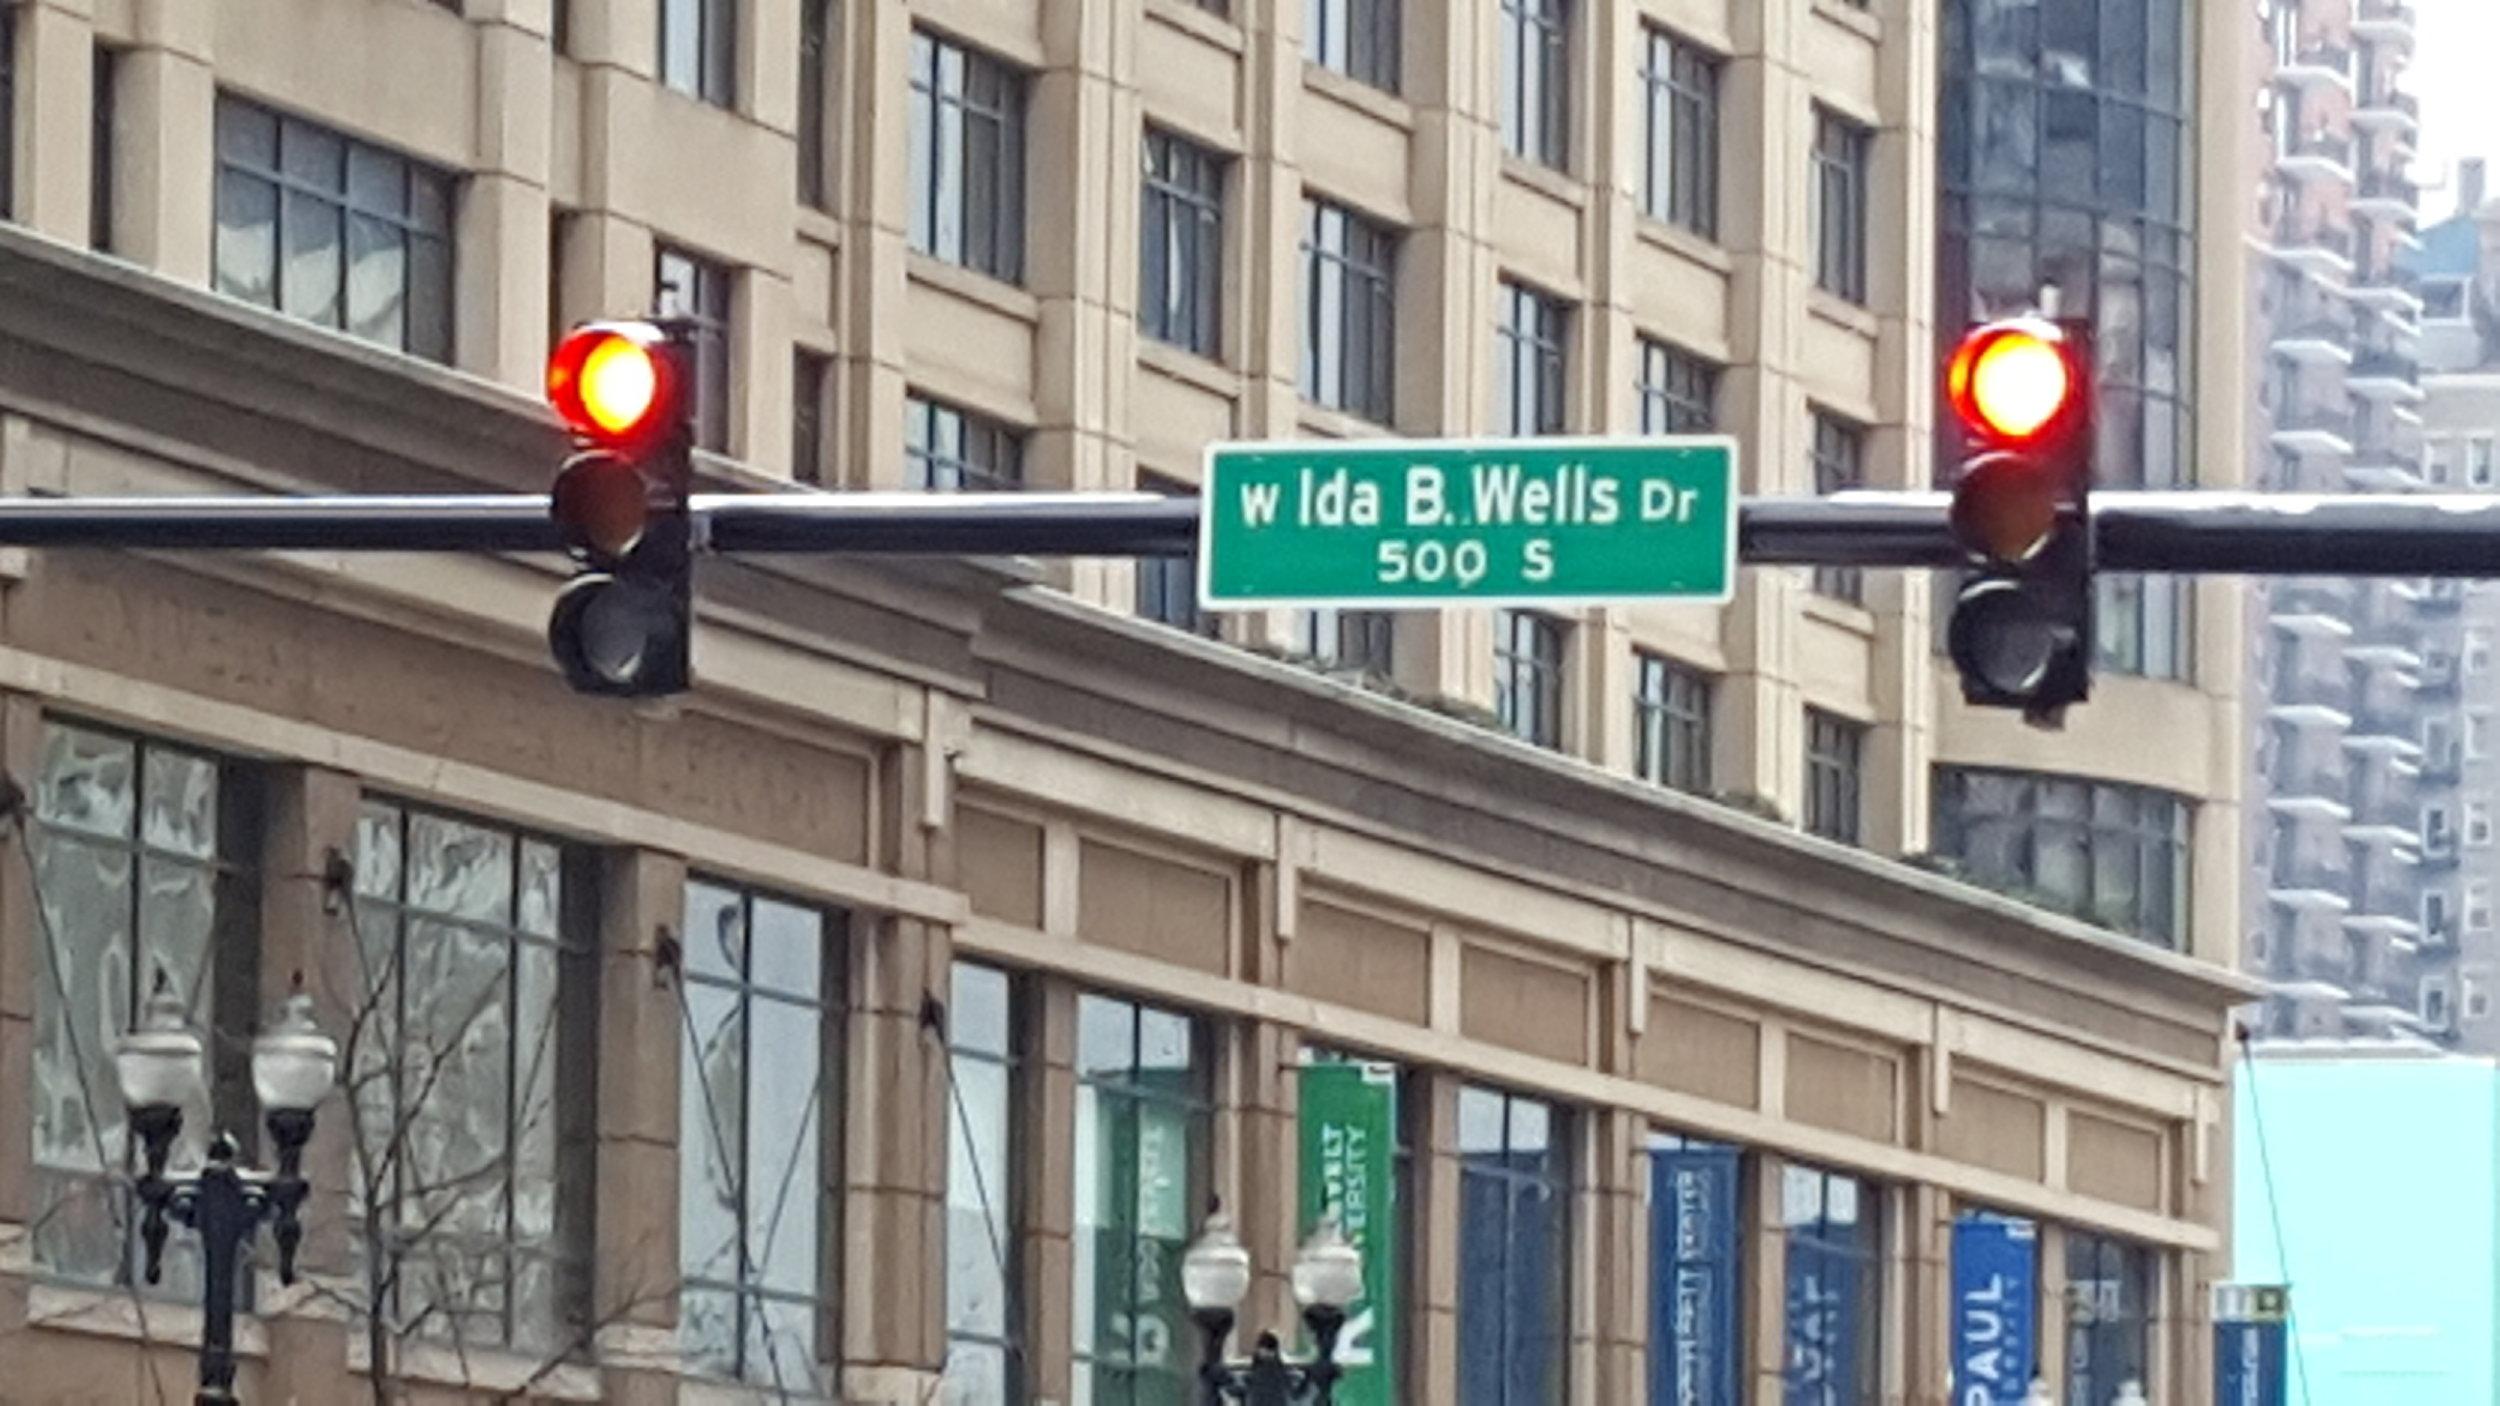 20190211_ida b wells dr_ honorary chicago.jpg